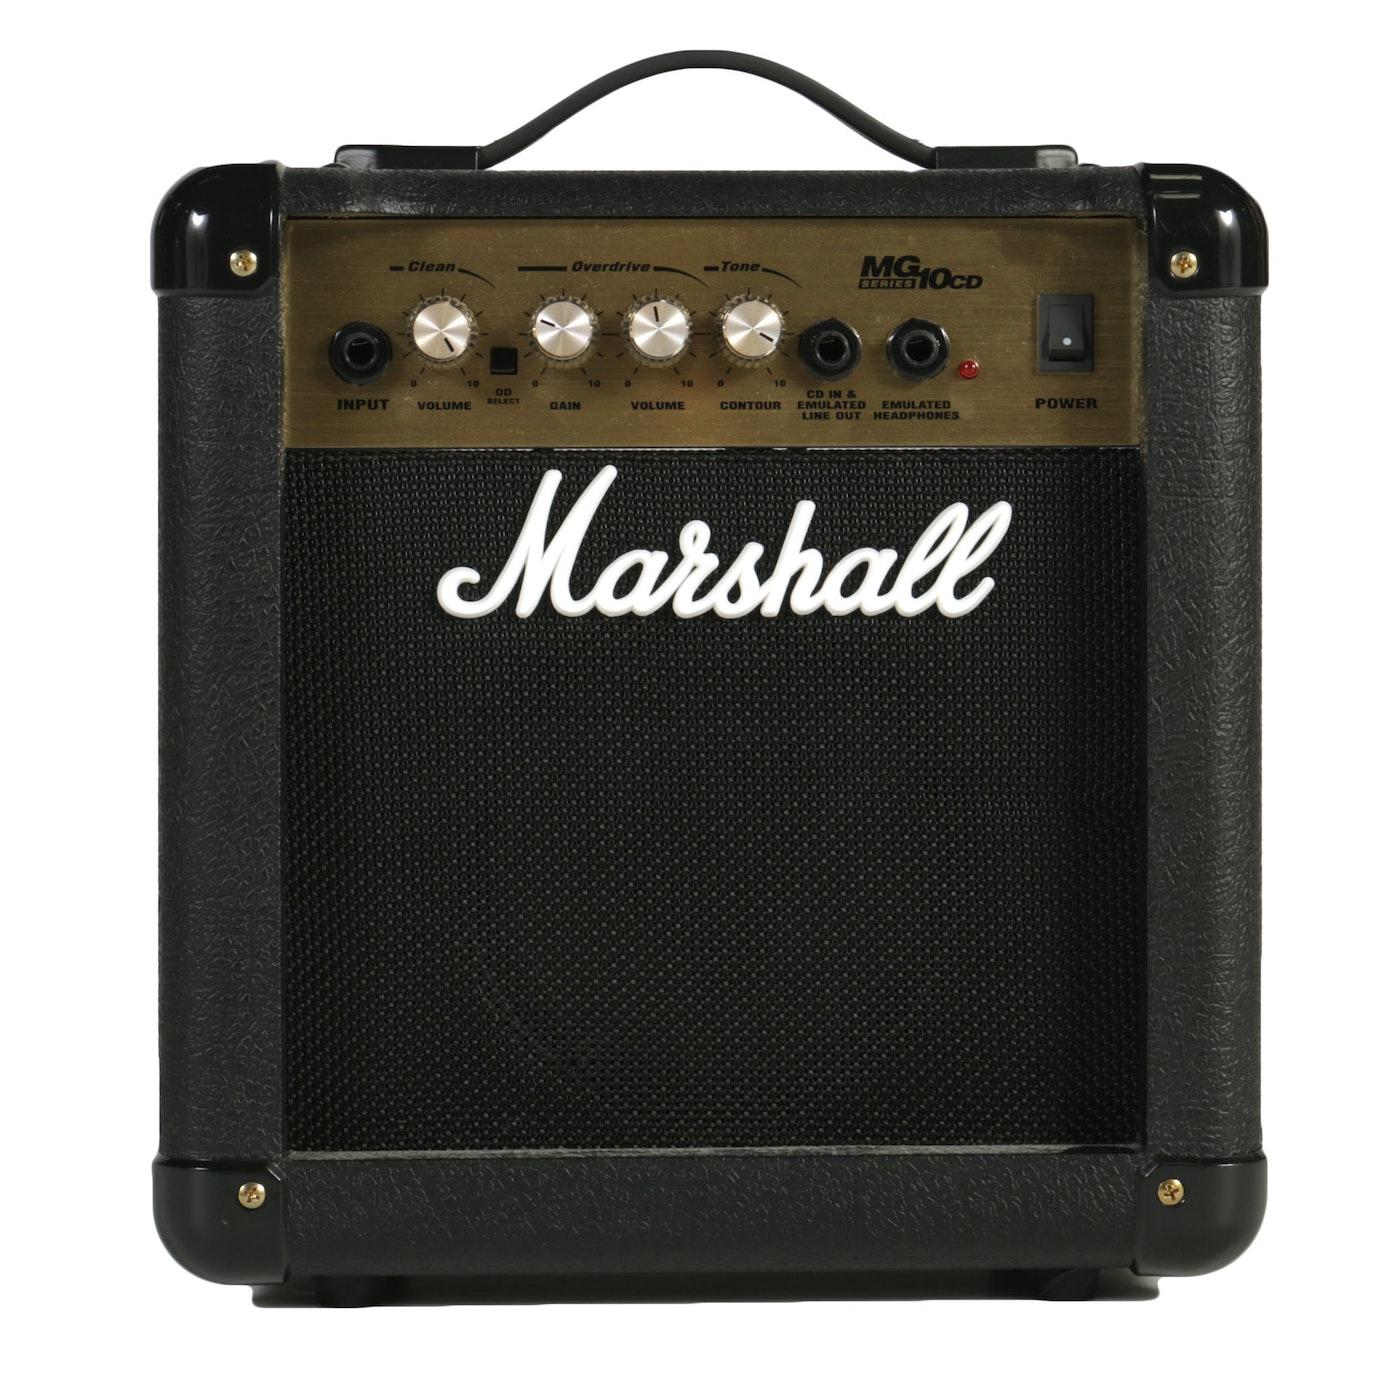 Marshall mg10cd amplifier ebth for California 2100 amp